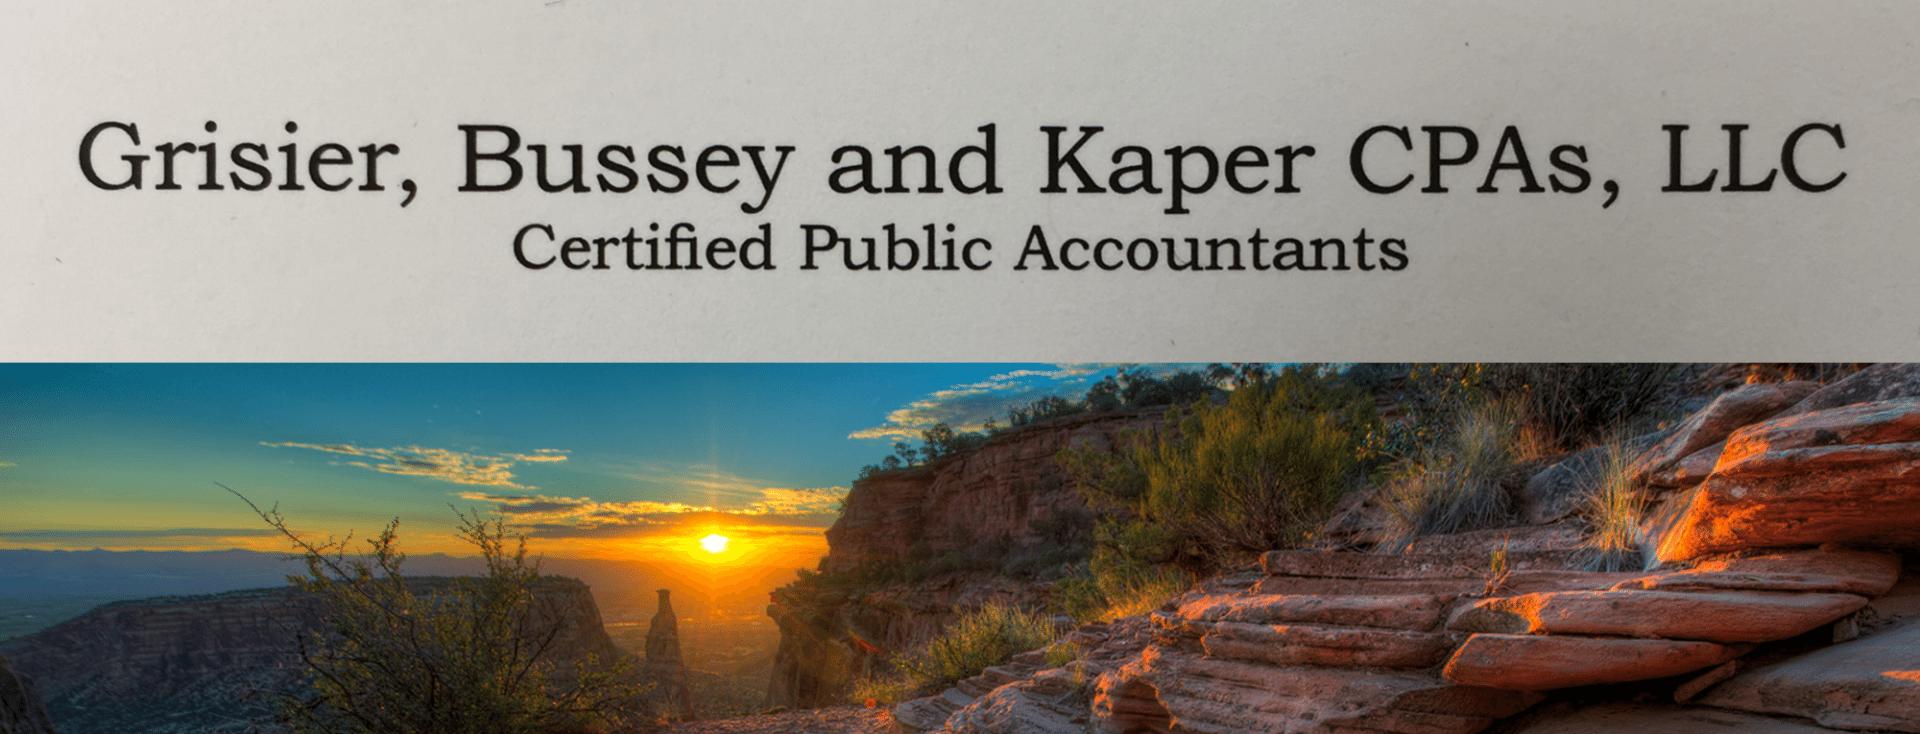 Grisier Bussey & Kaper CPA's LLC logo